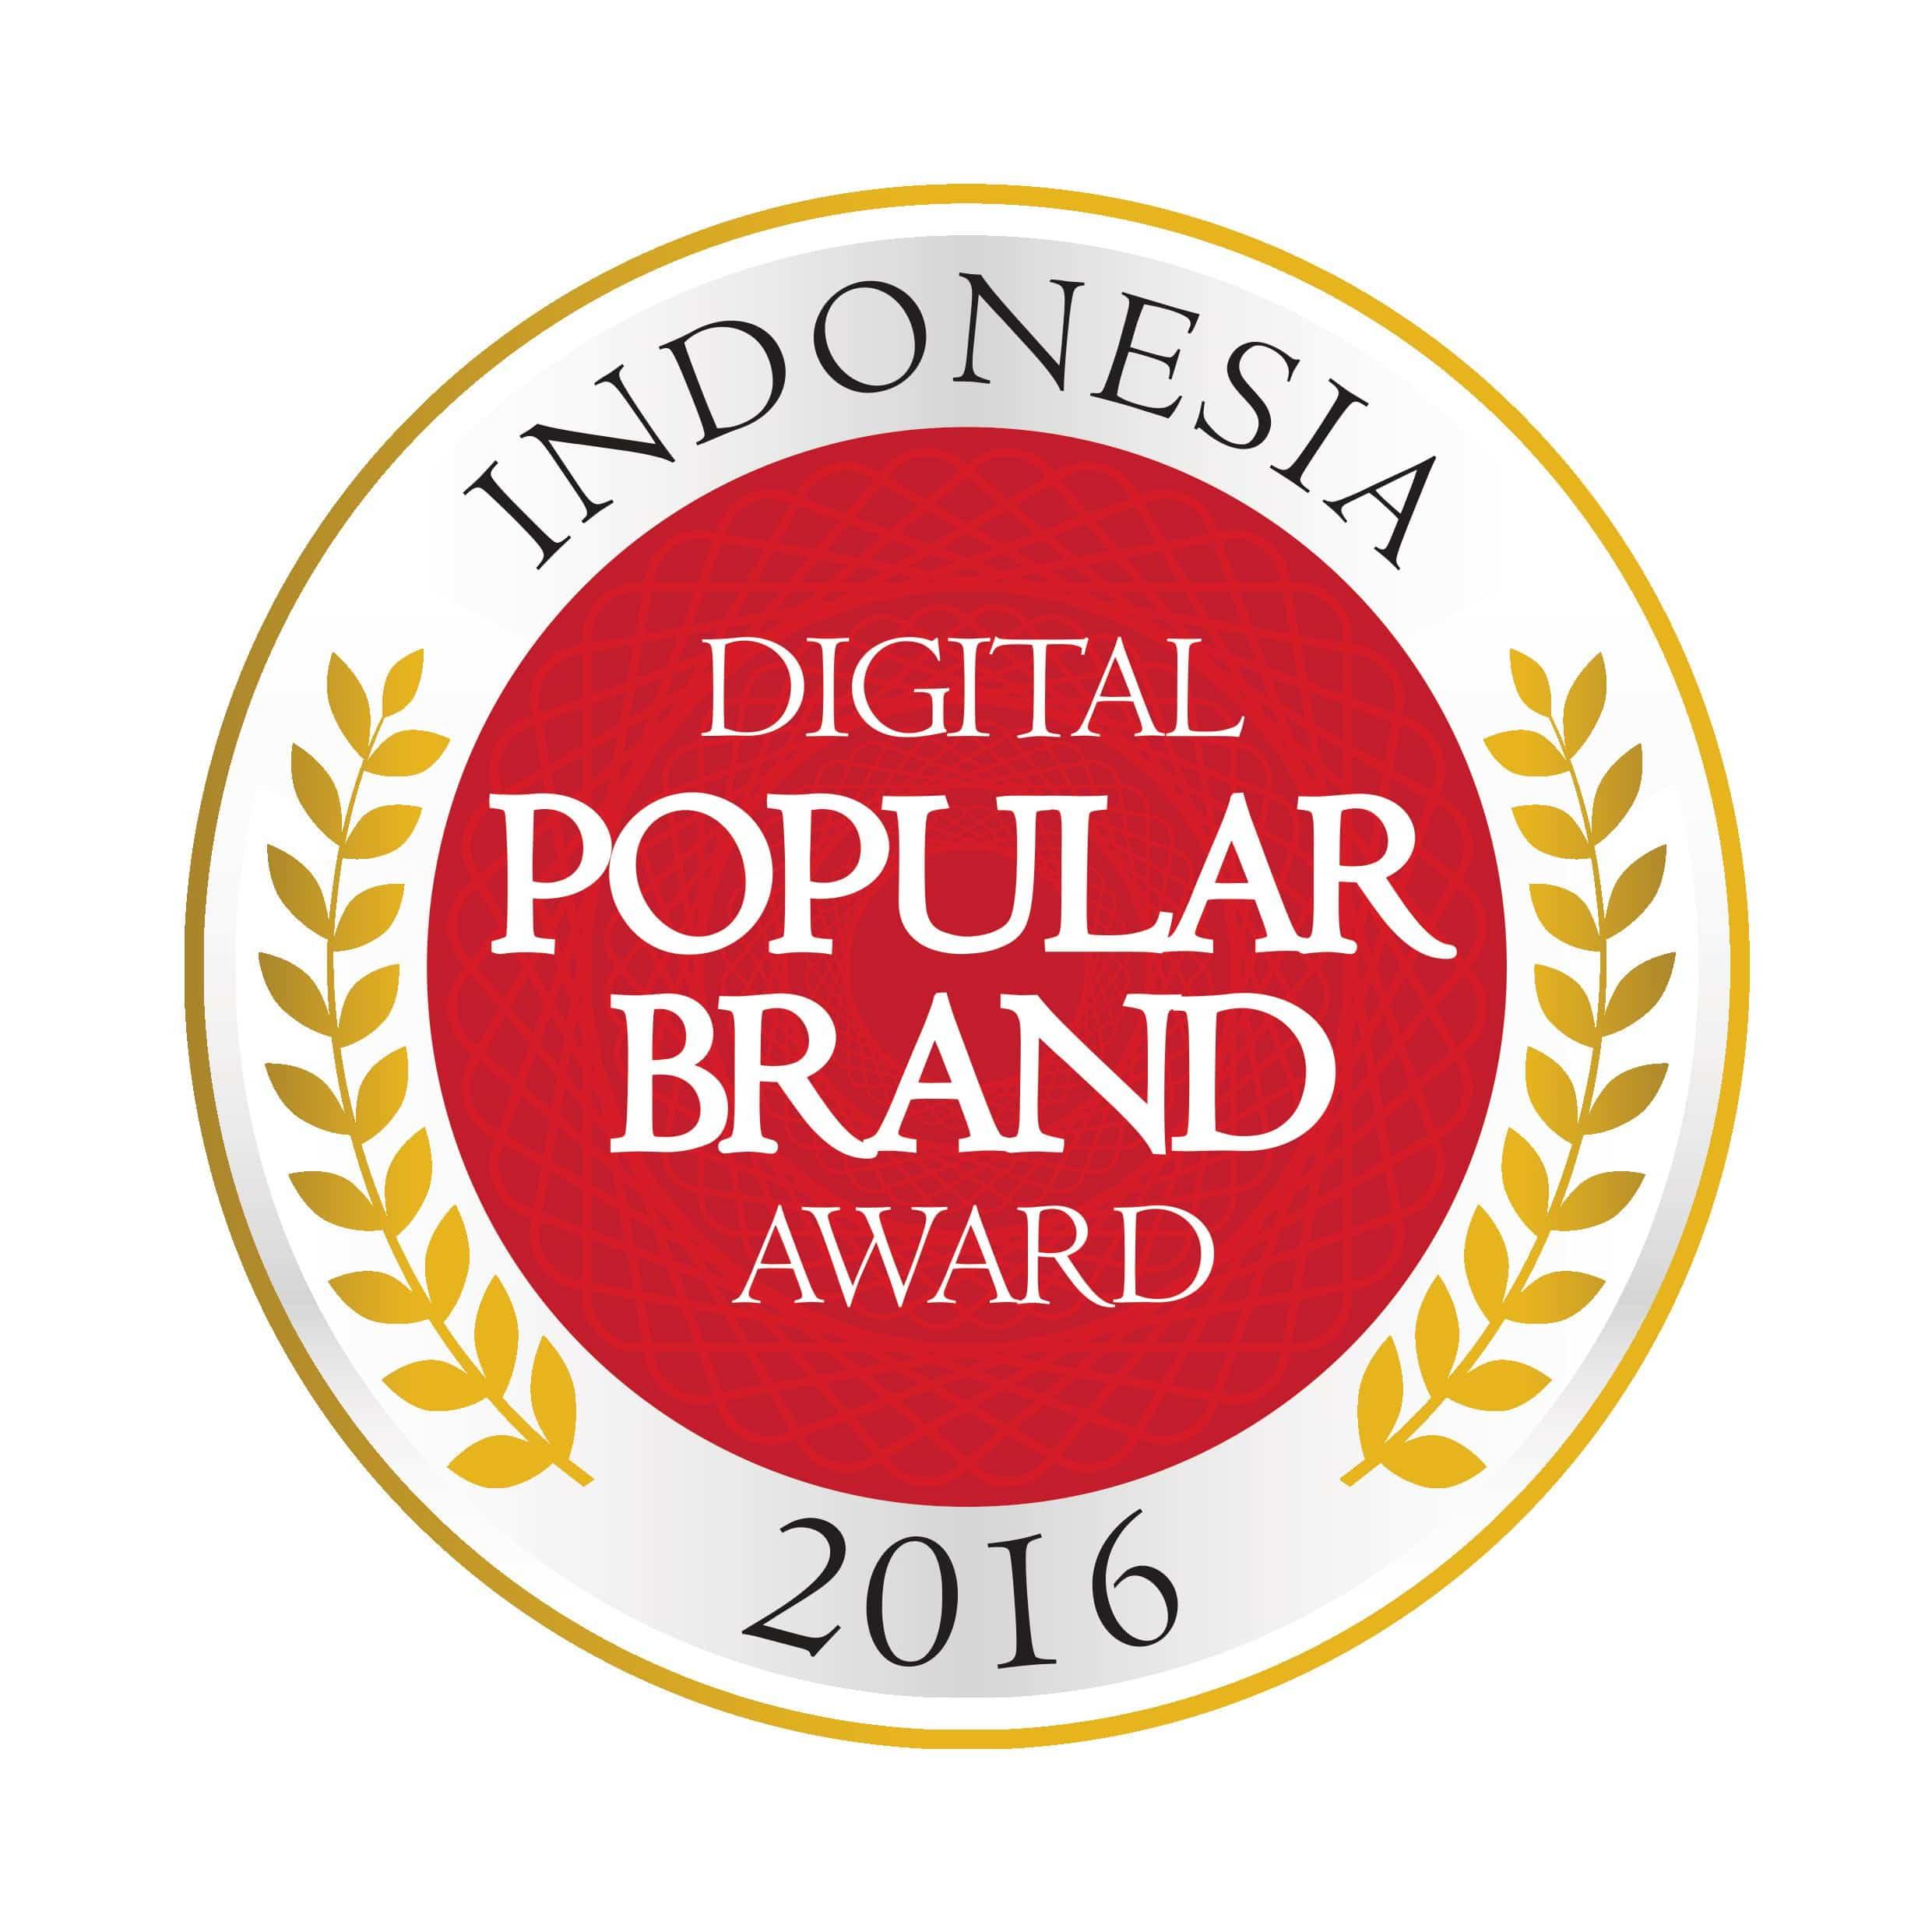 INDONESIA DIGITAL POPULAR BRAND AWARD 2016